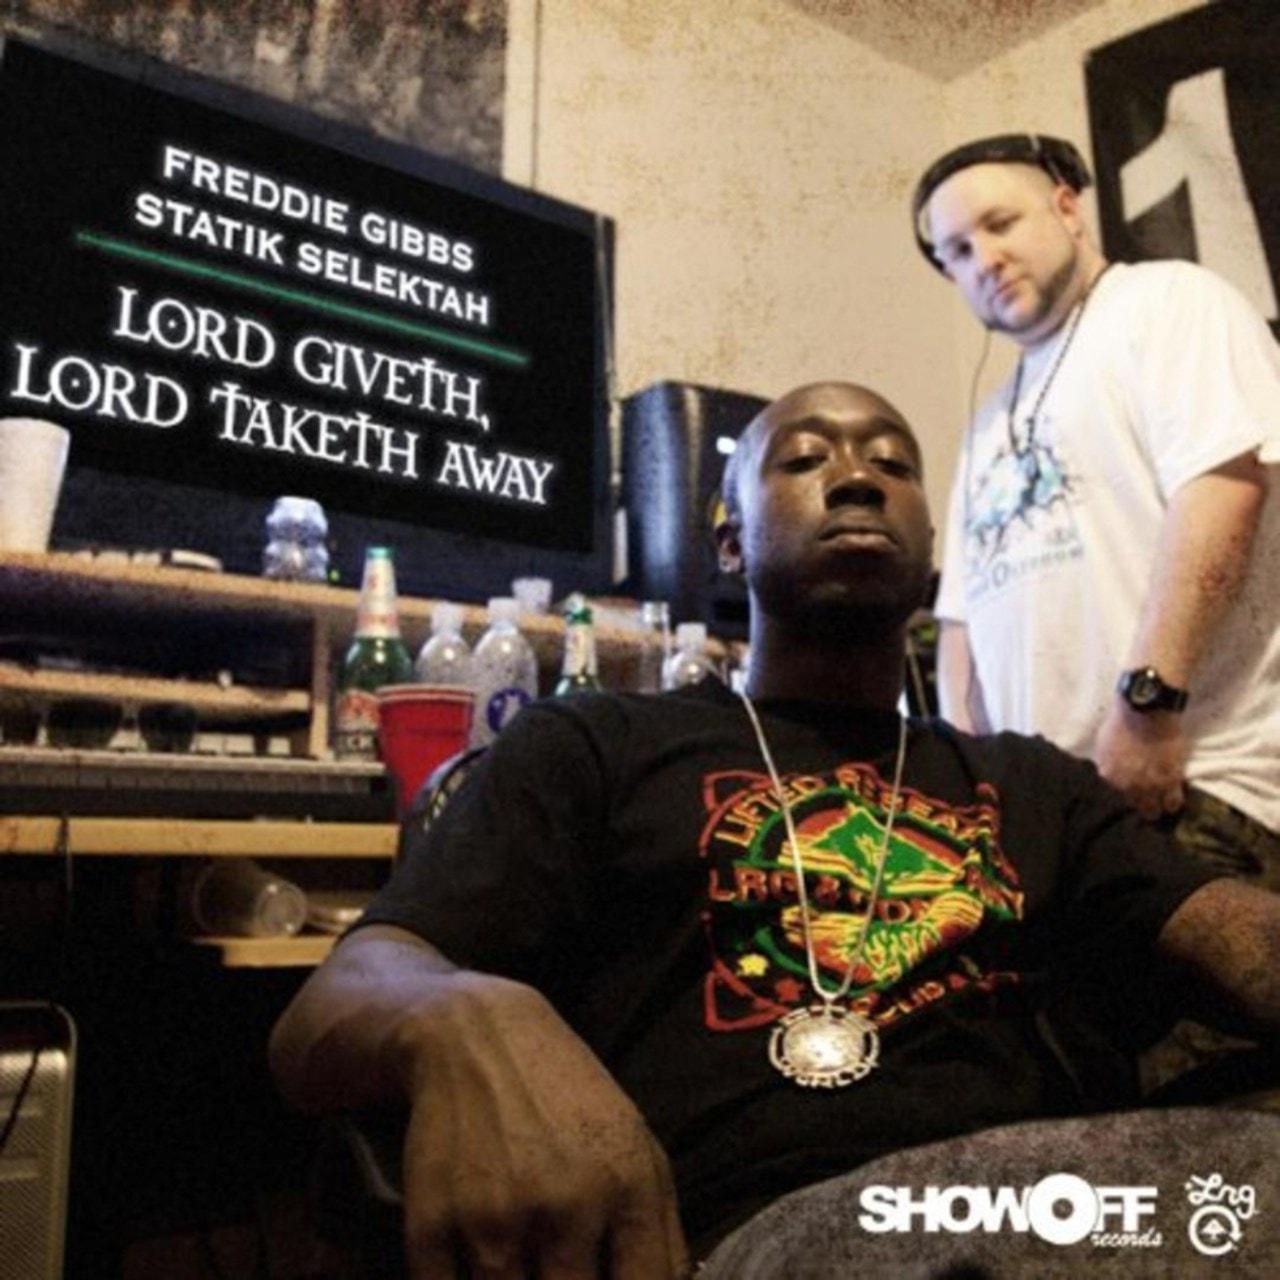 Lord Giveth, Lord Taketh Away - 1